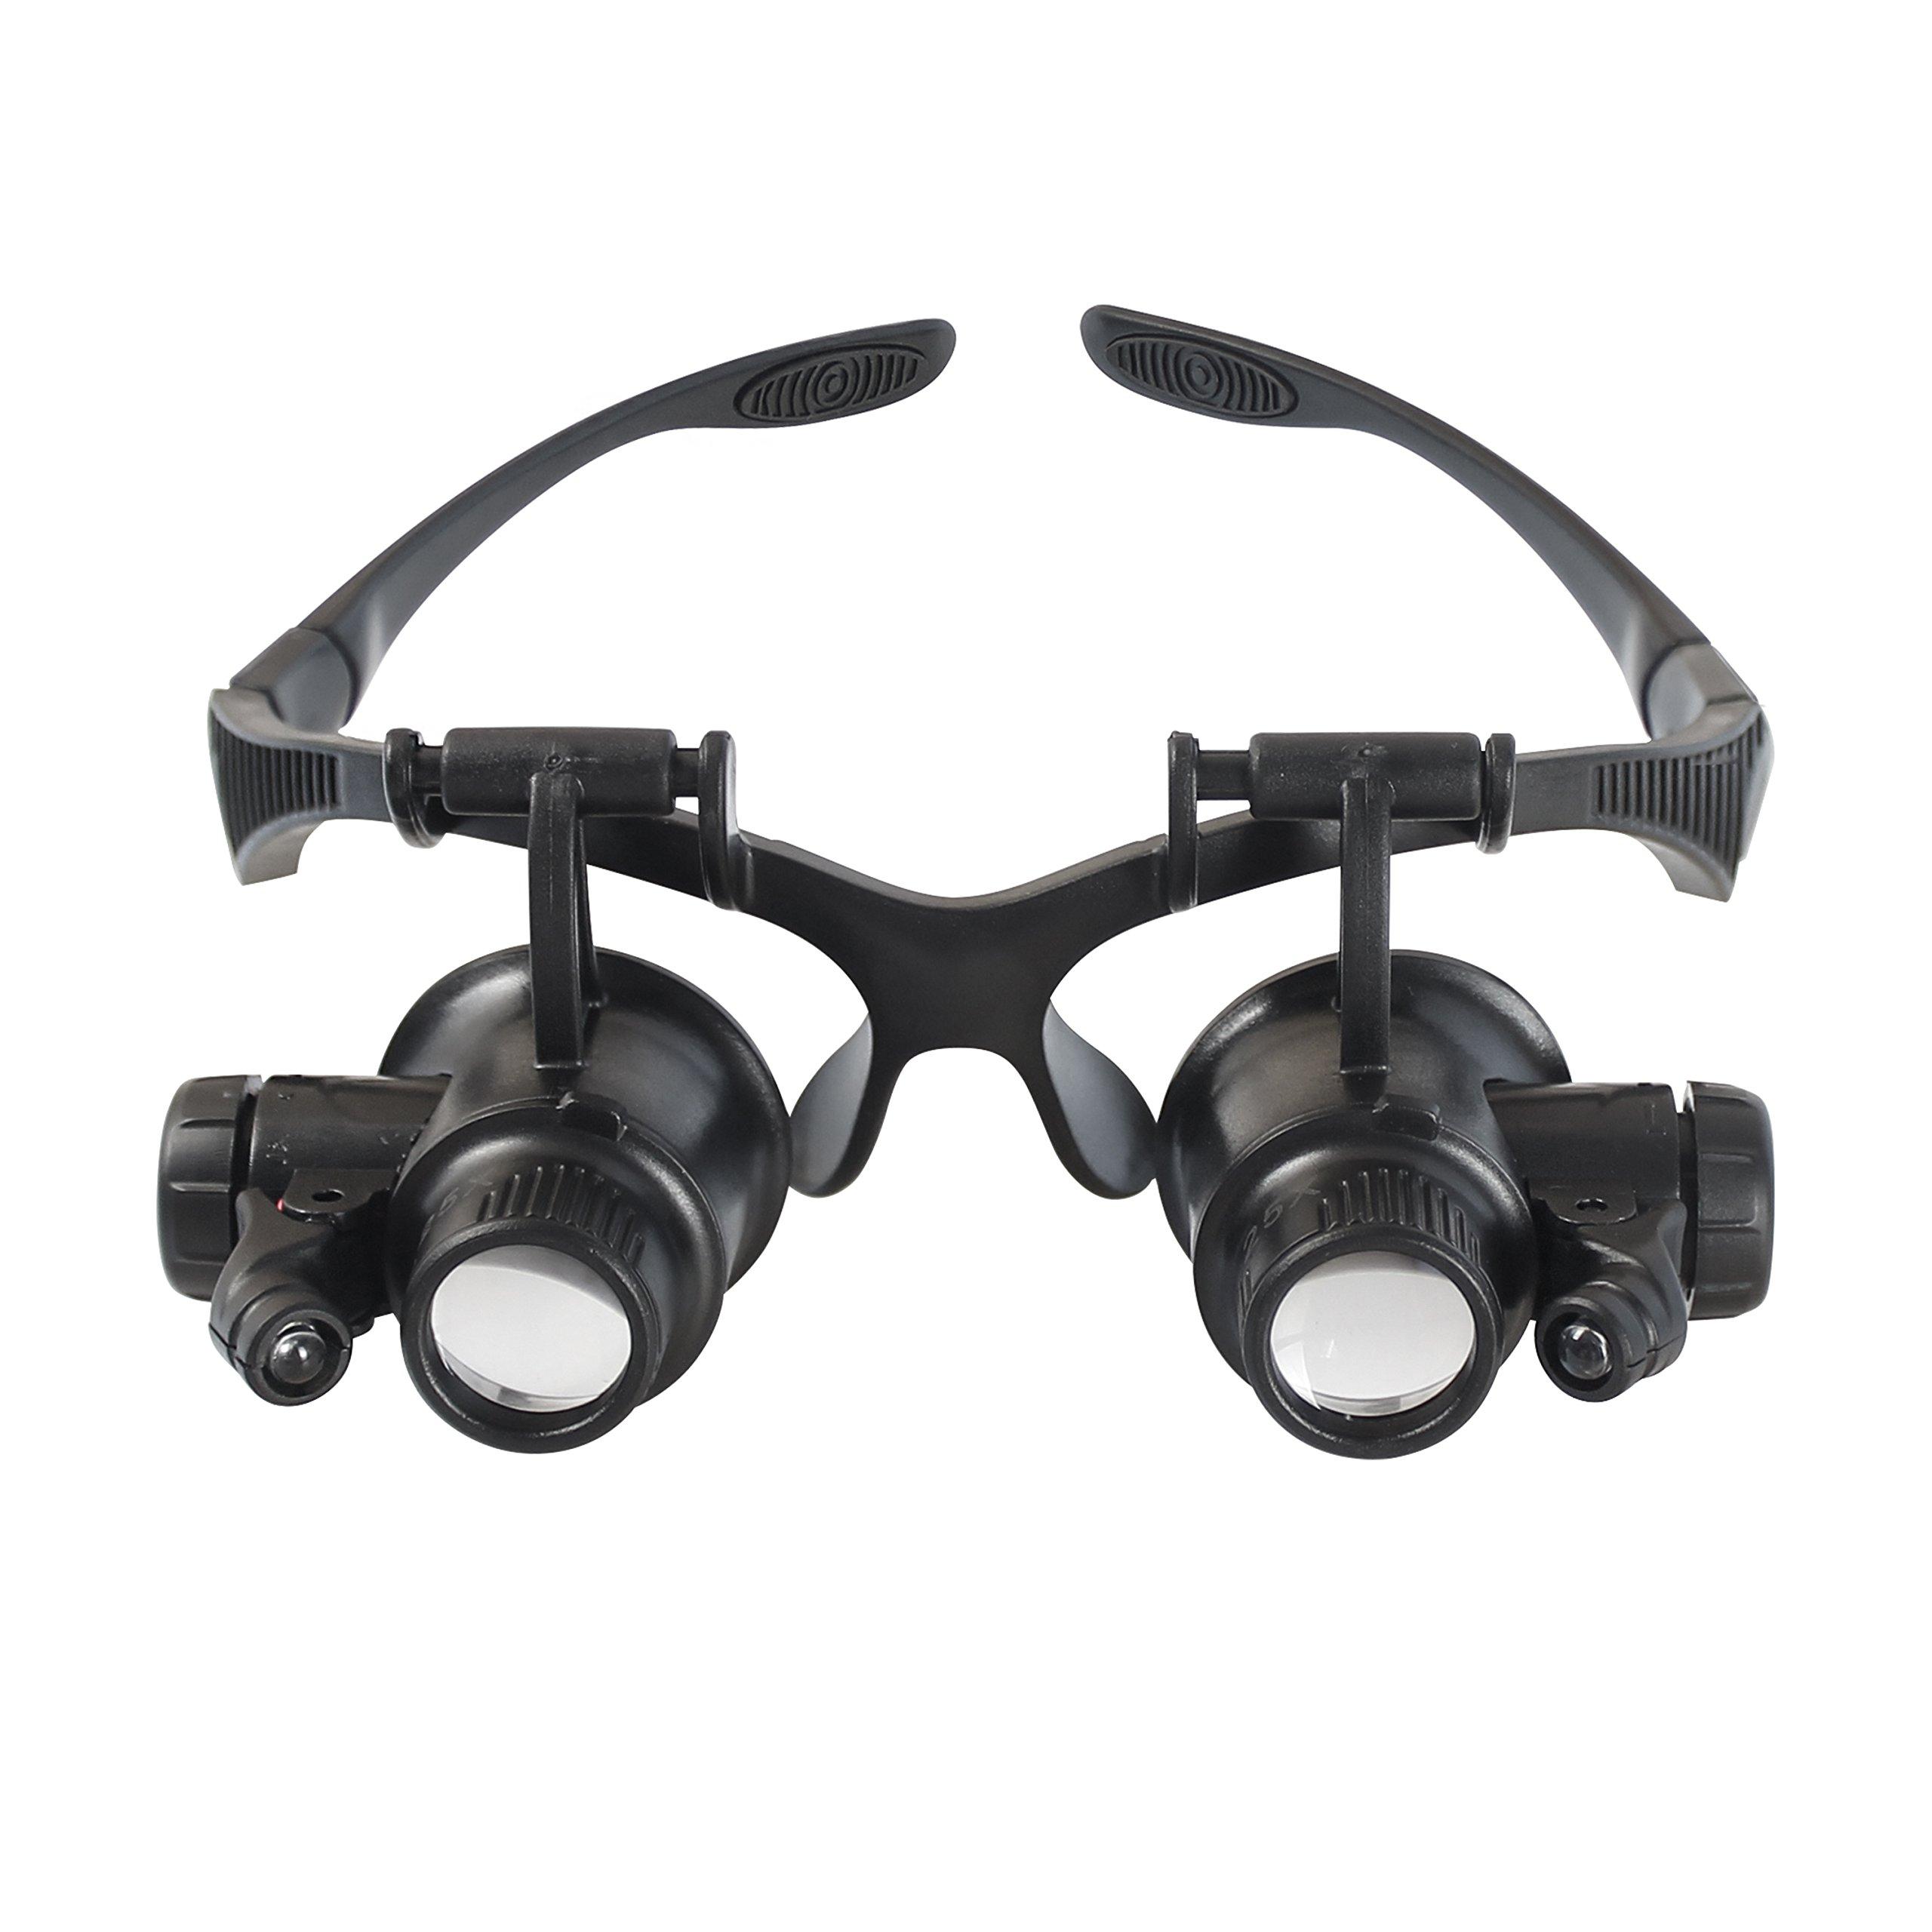 Aomekie LED Illuminated Double Eye Jeweler Watch Repair Magnifying Glasses Loupe Headband Magnifier -8 Interchangeable Lens: 2.5X/4X/6X/8X/10X/15X/20X/25X